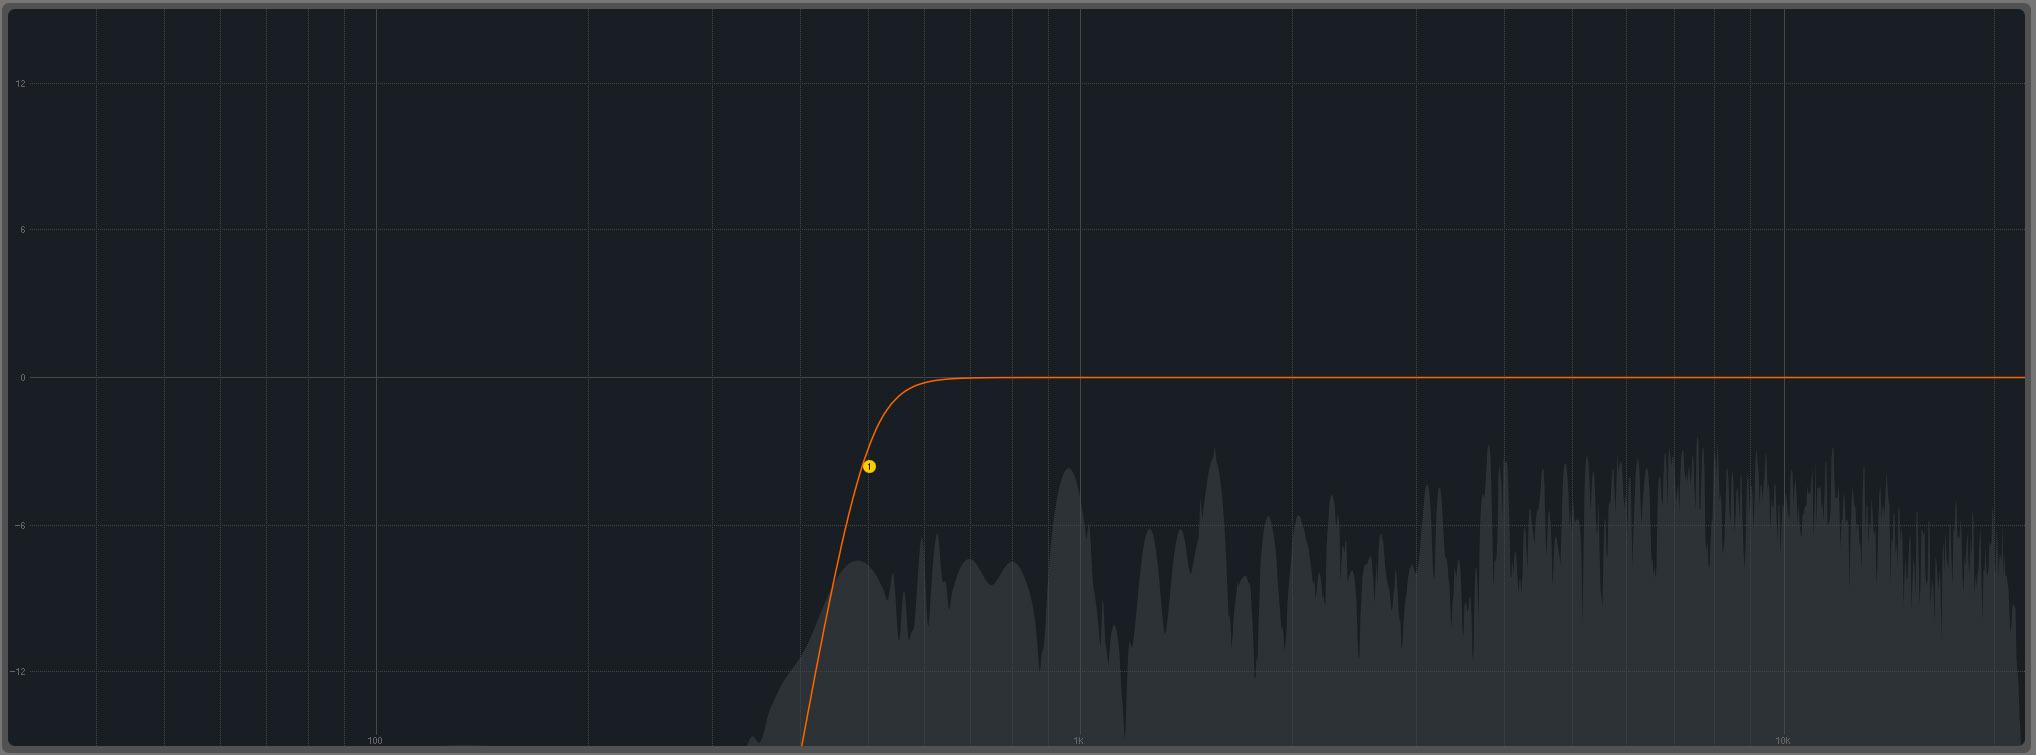 Bassline compression and hats EQ